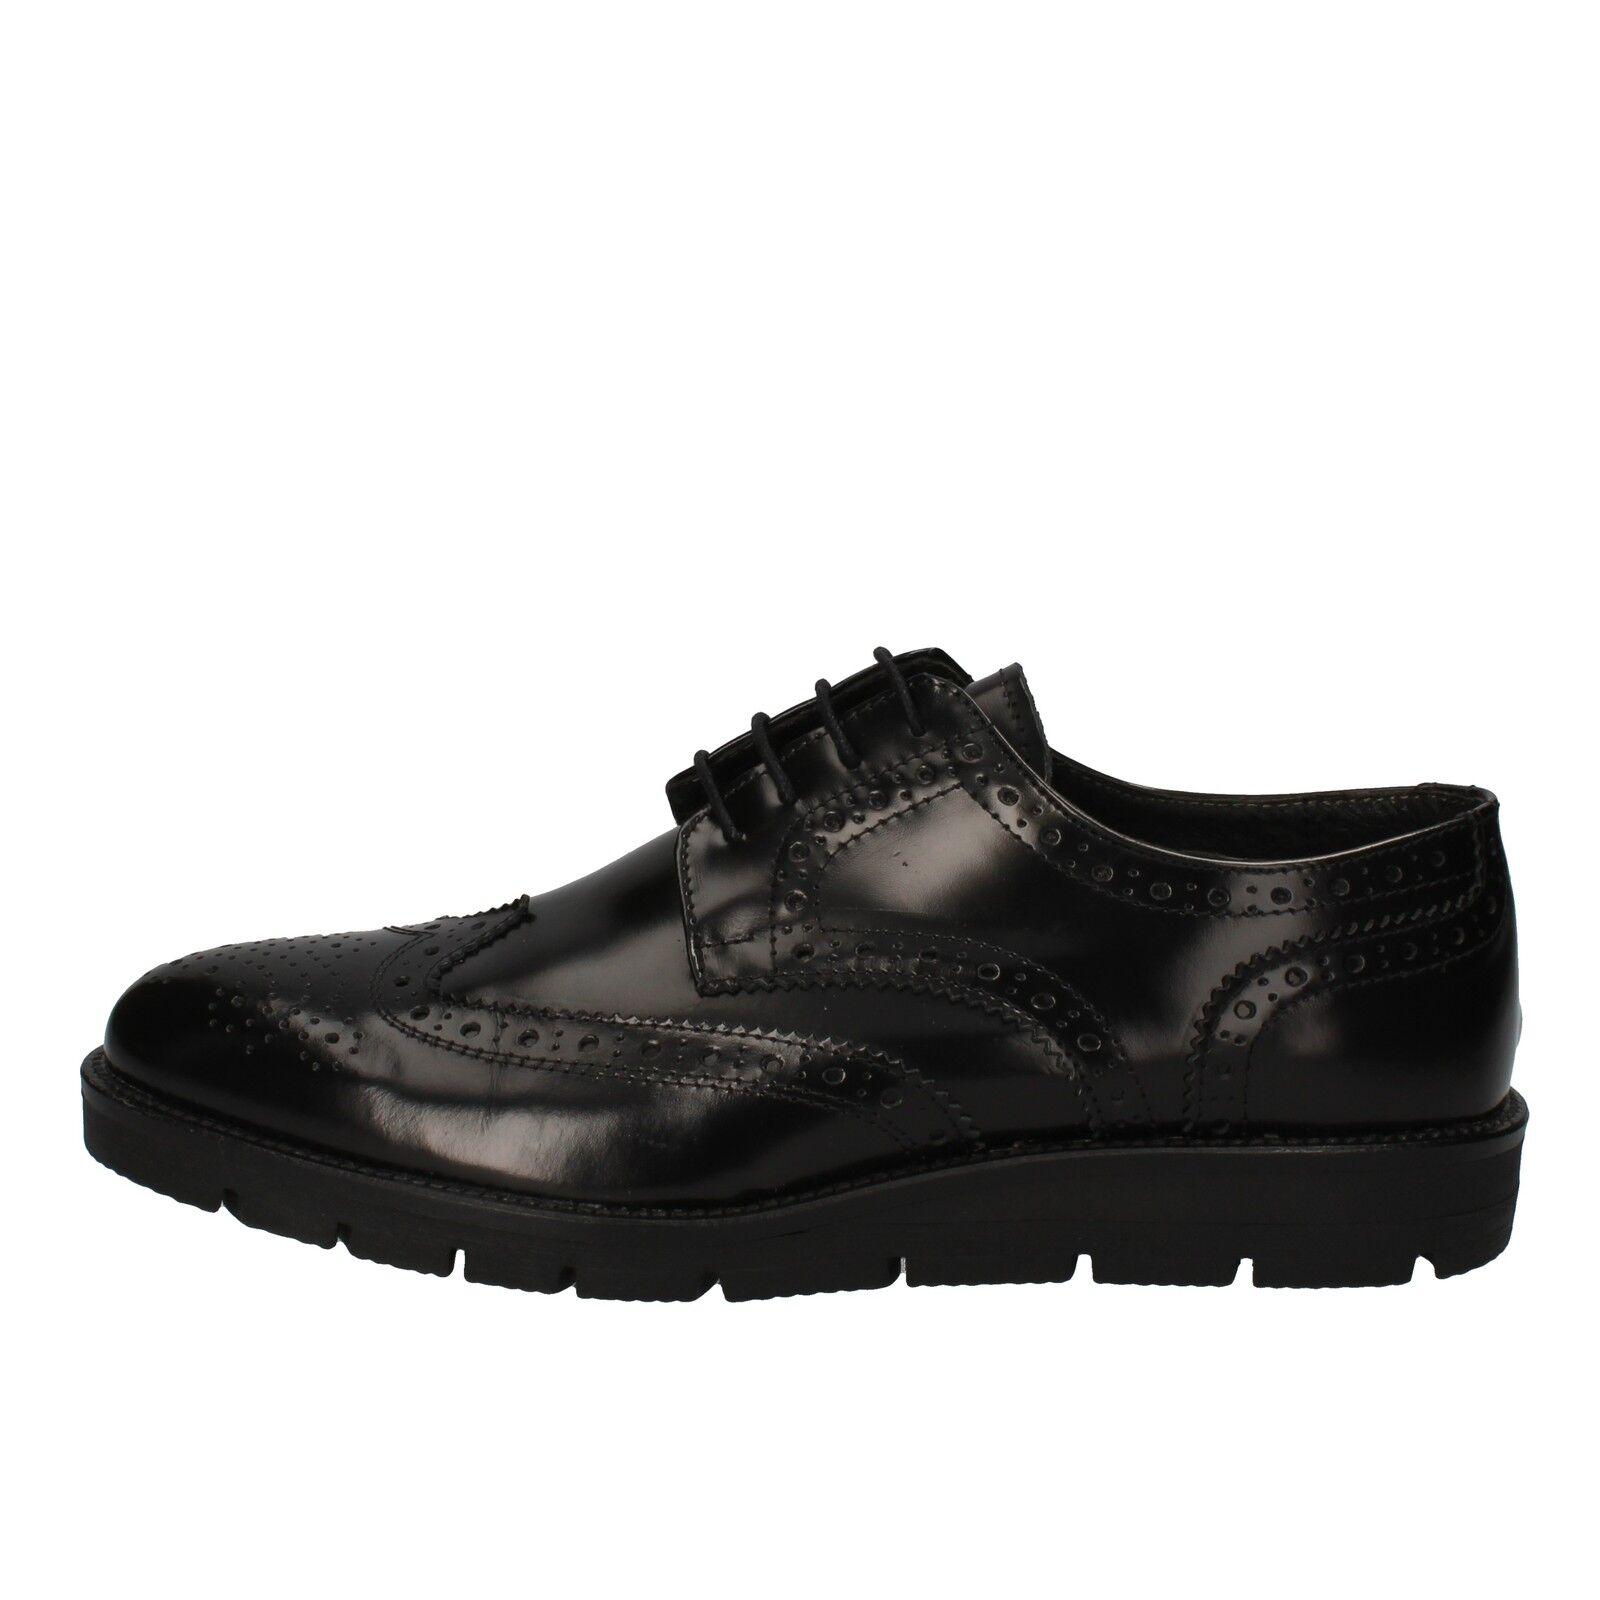 Scarpe casual da uomo  Scarpe UOMO J BREITLIN 41 UE elegante pelle nera ad14-c